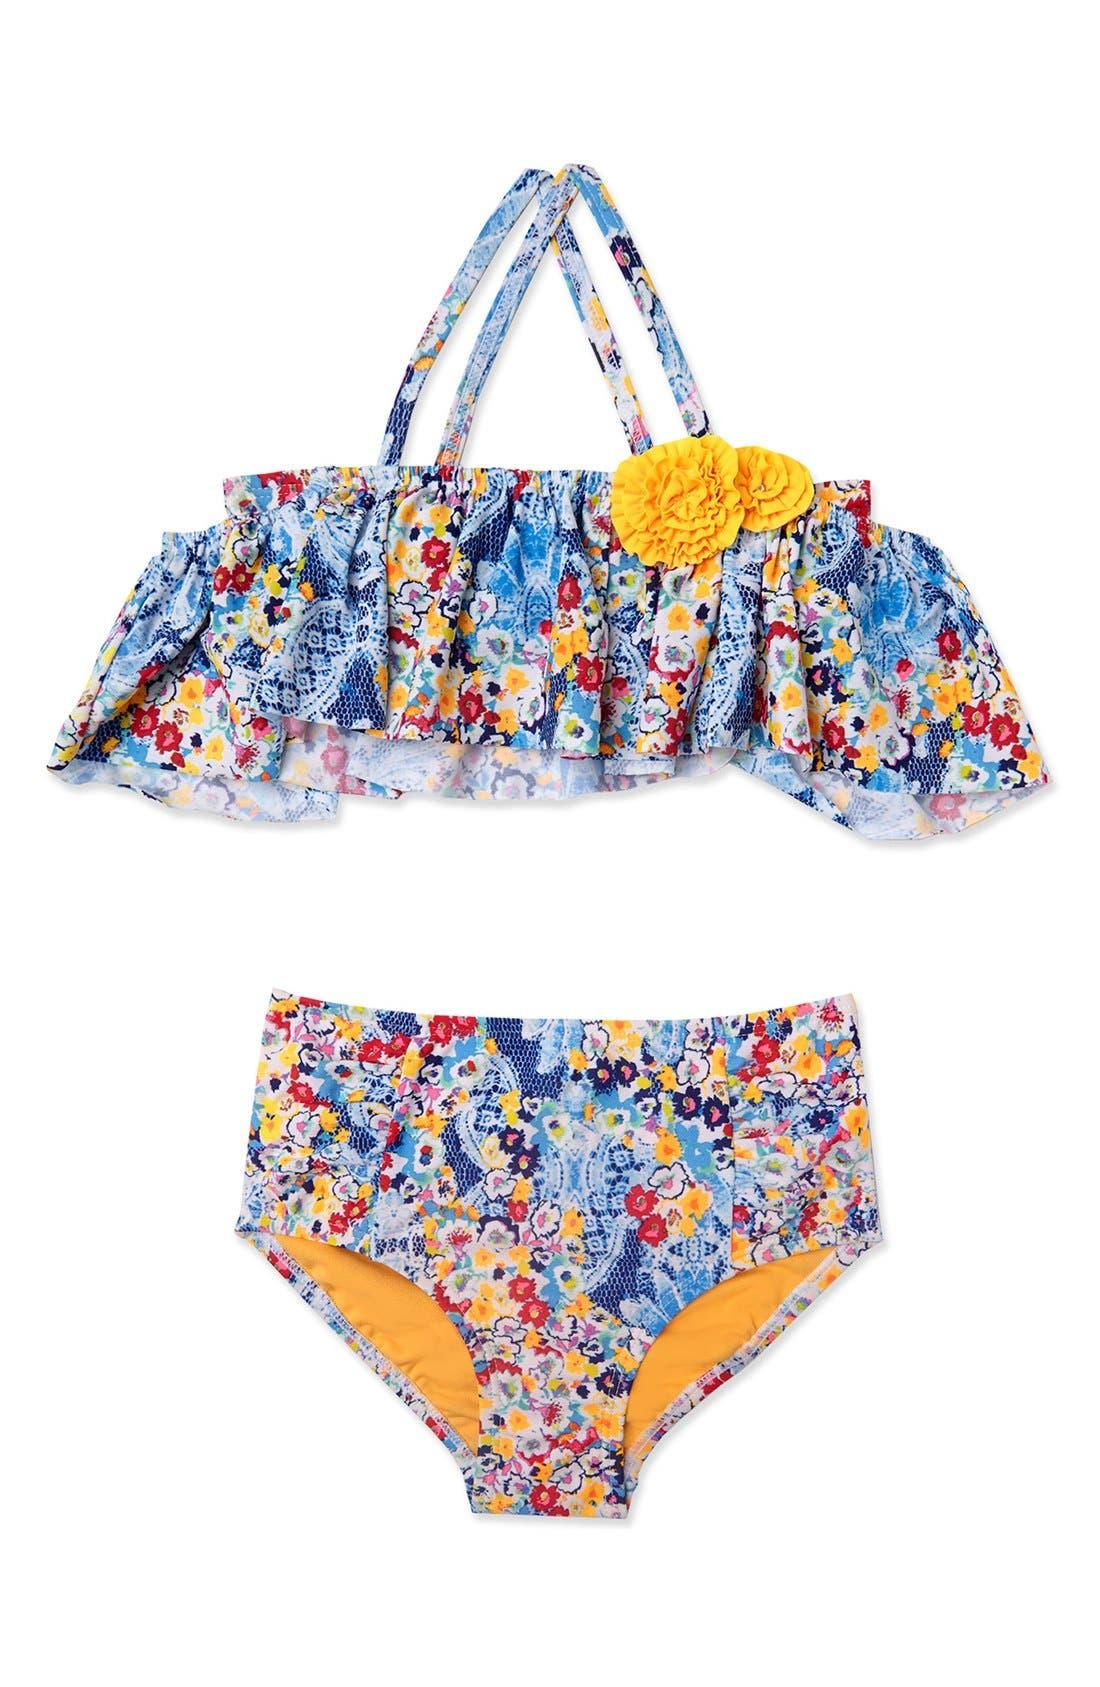 Main Image - Hula Star 'Heavy Petal' Two-Piece Swimsuit (Toddler Girls & Little Girls)